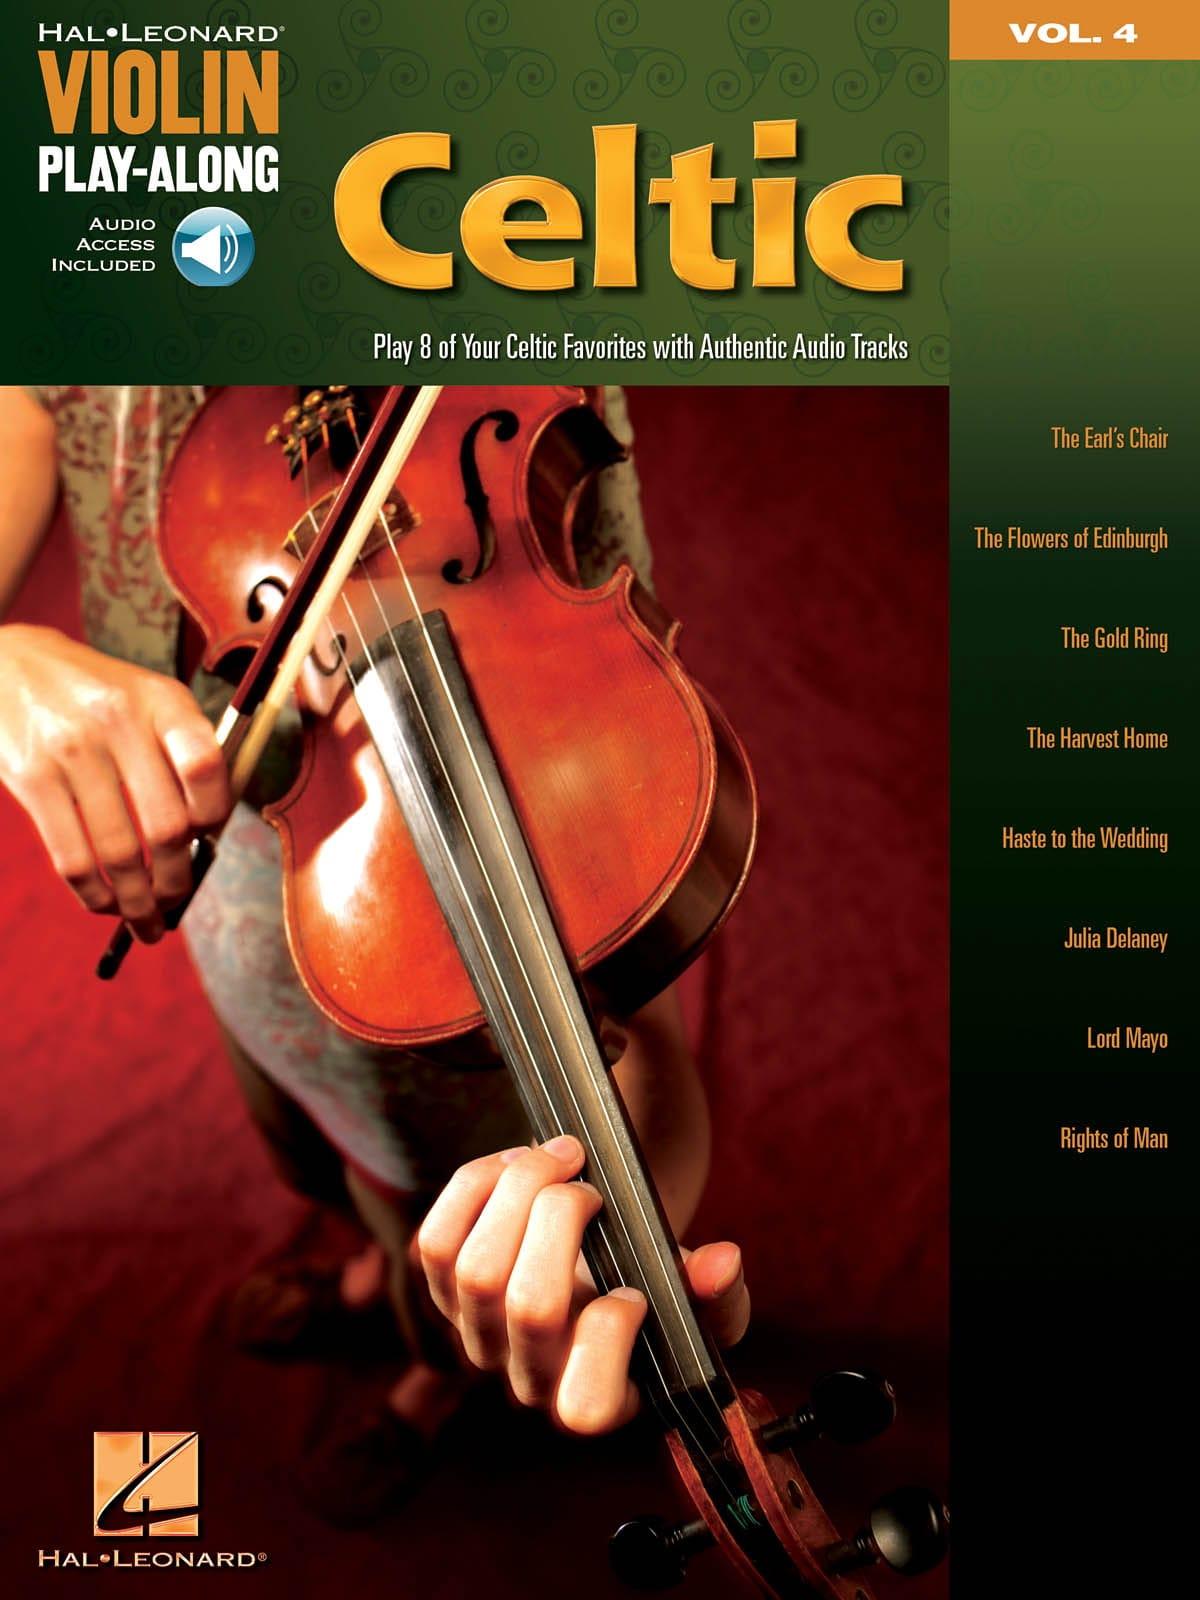 Violin Play-Along Volume 4 - Celtic - Partition - laflutedepan.com